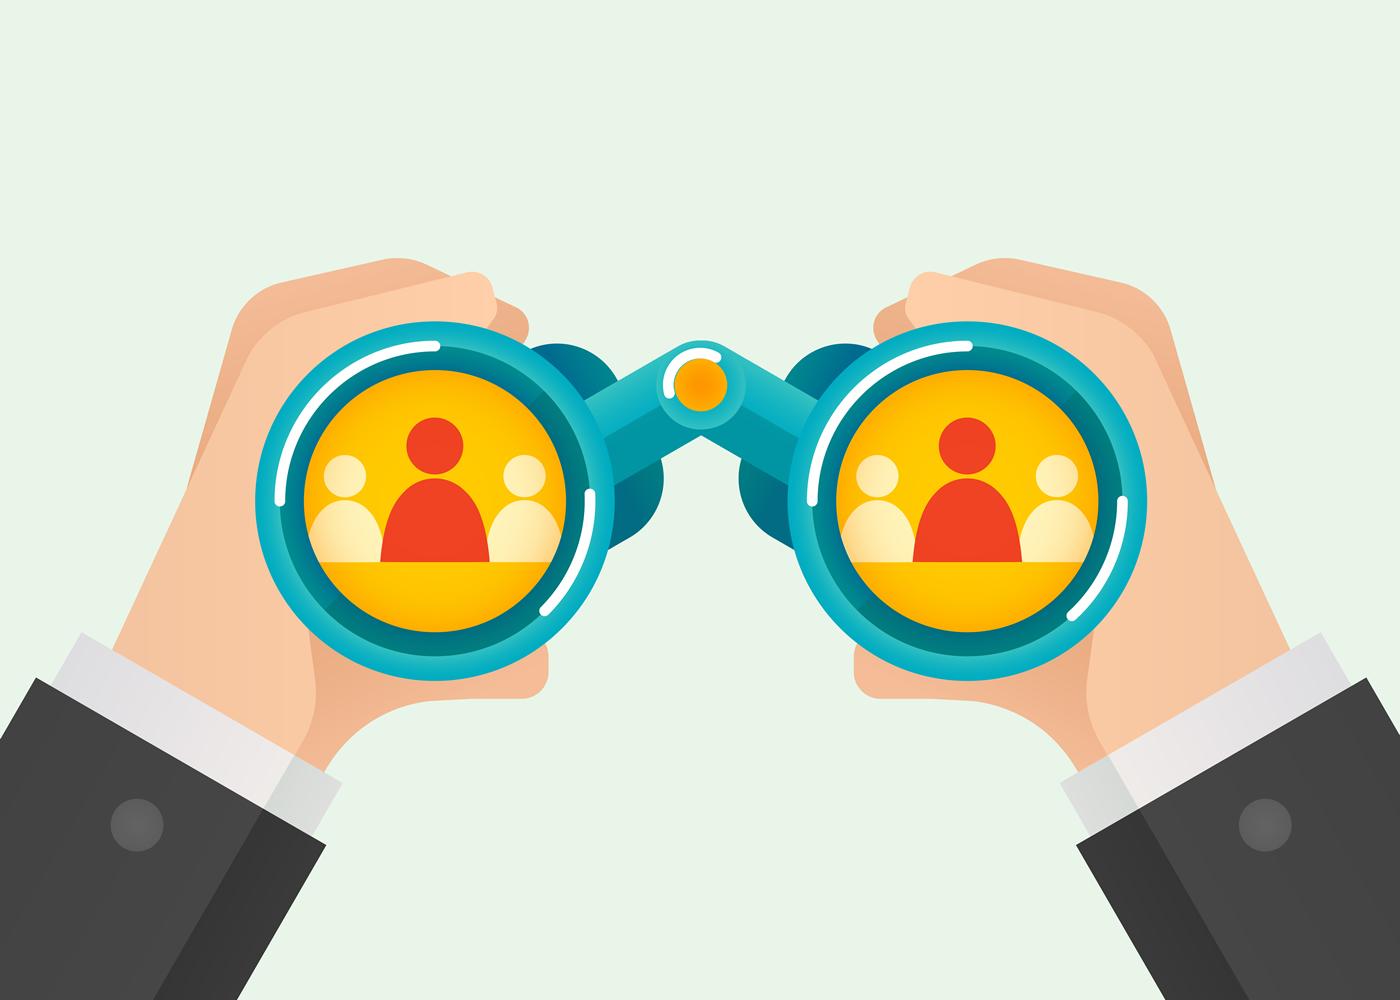 naem-research-quickpolls-2018-02-hse-recruitment-700x500